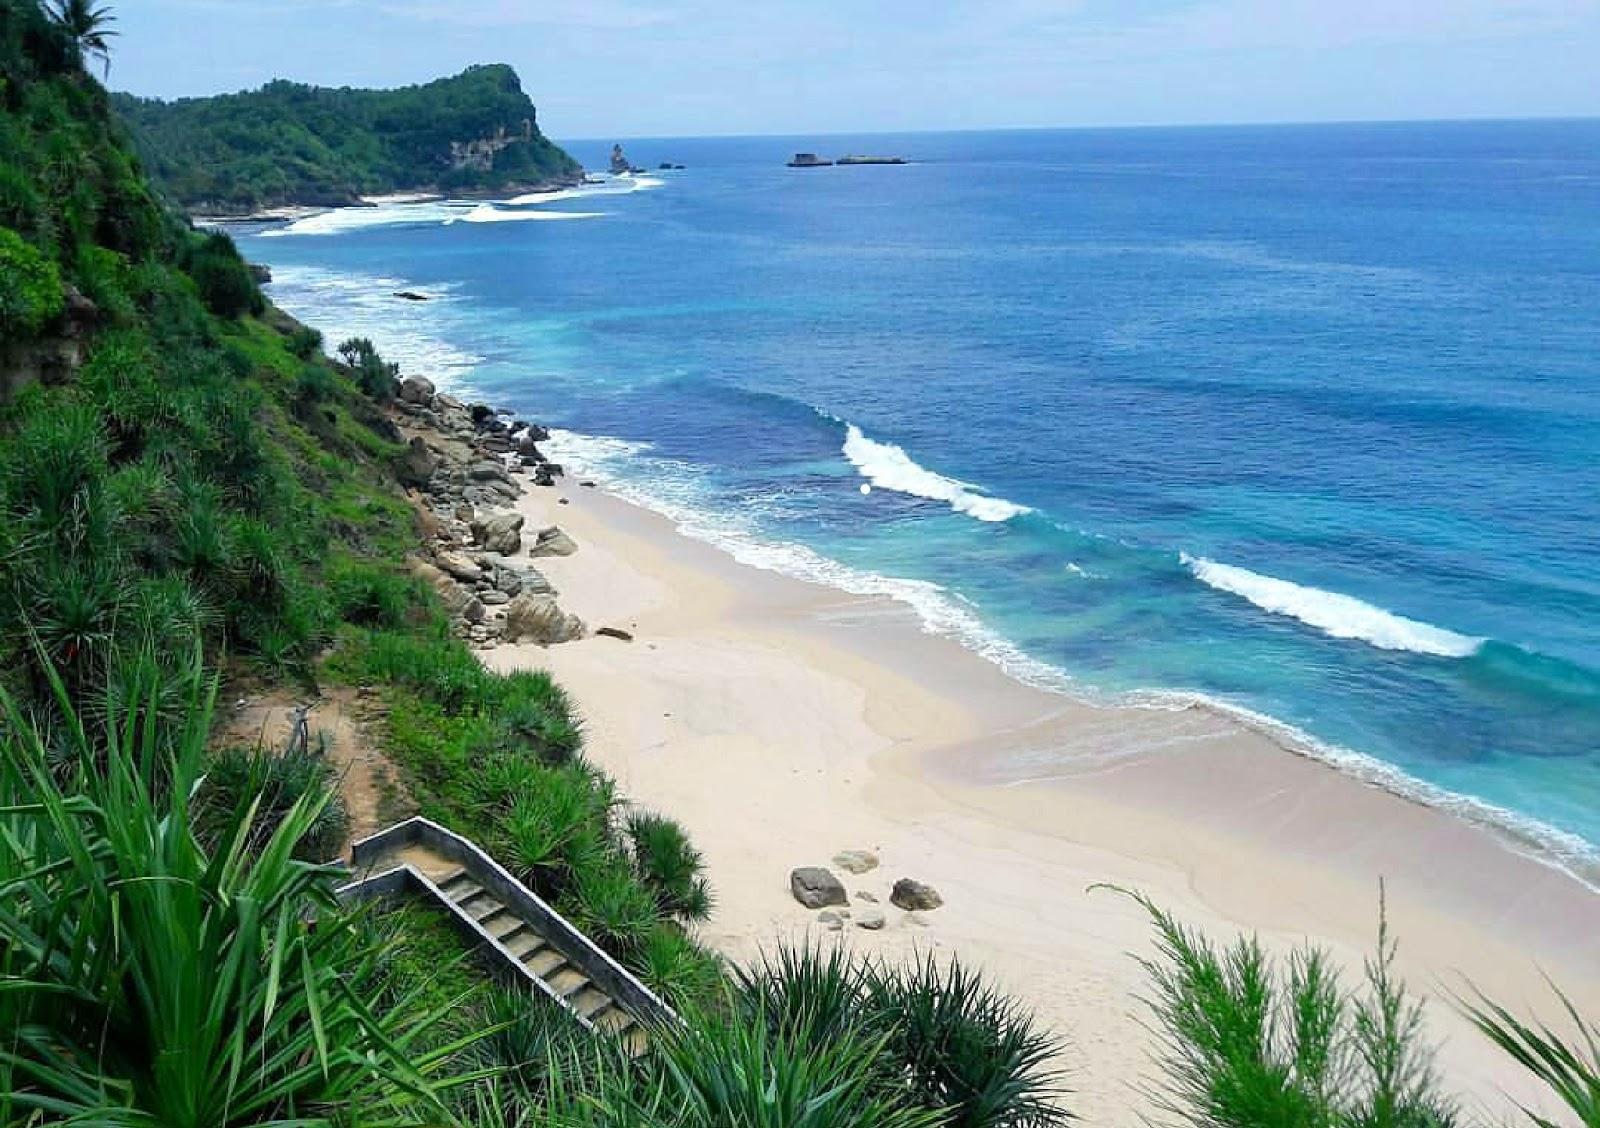 10 Gambar Pantai Kijingan Pacitan Jawa Timur, Rute dan Tiket Masuknya